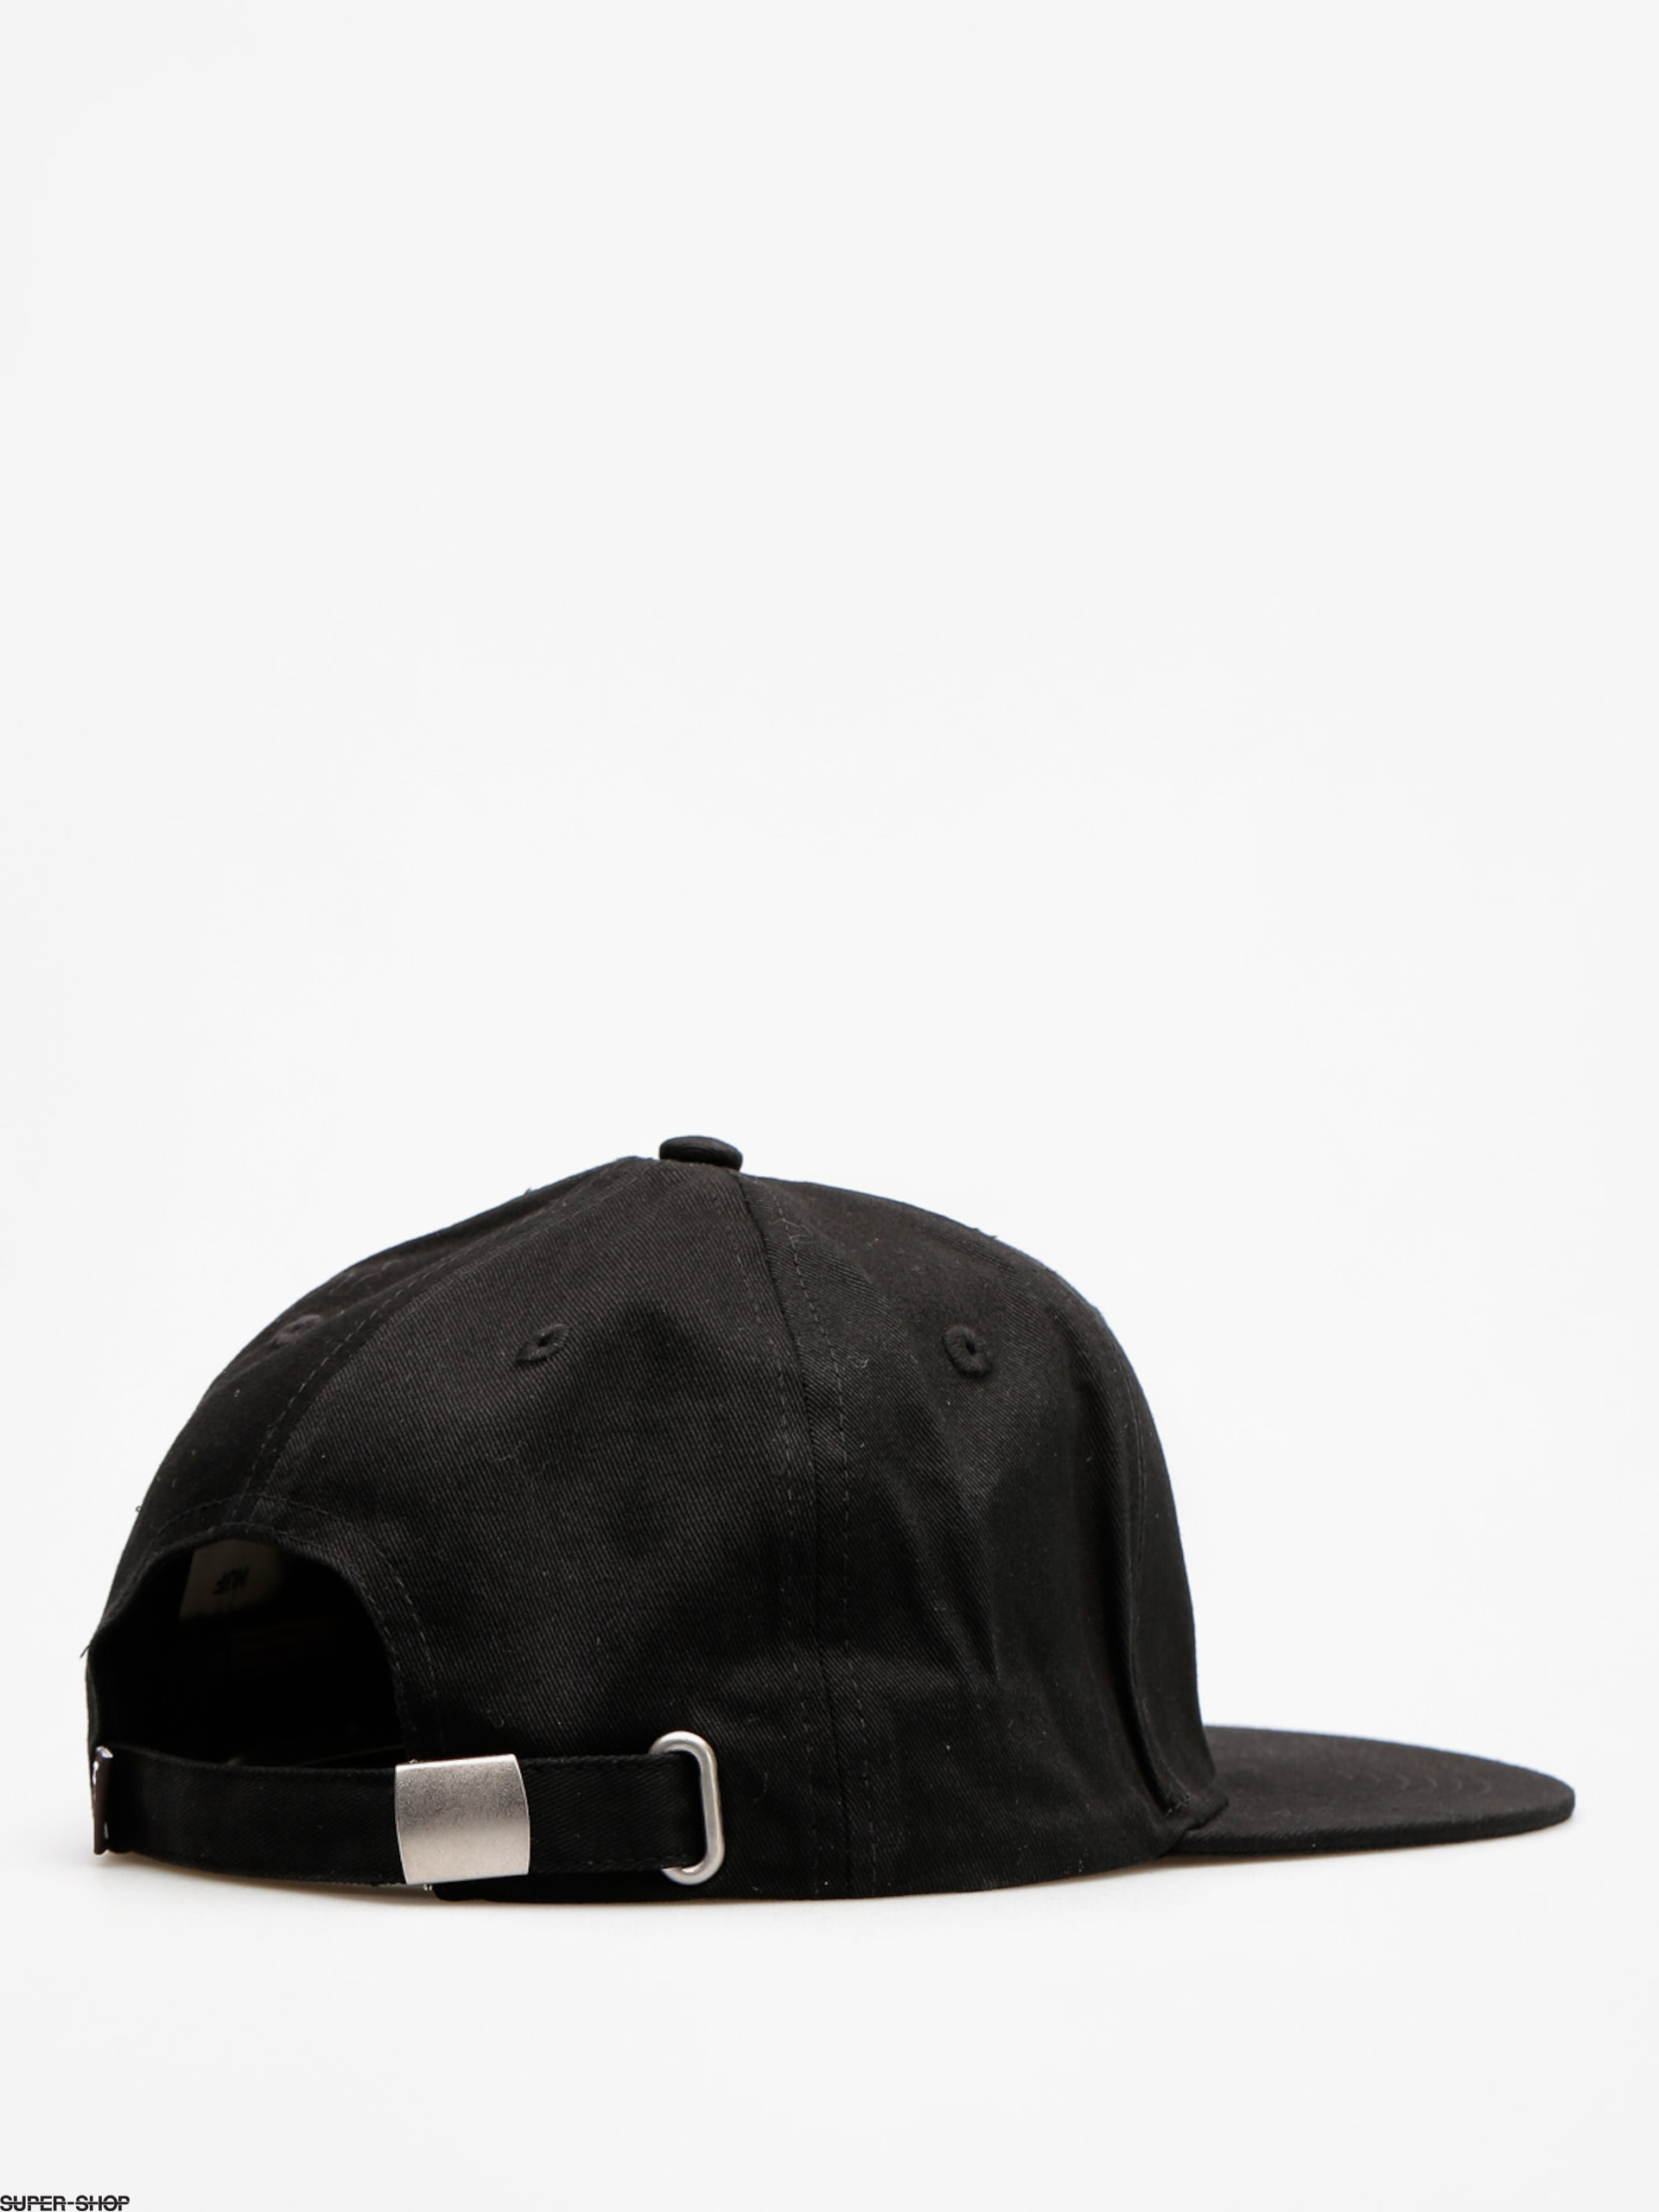 8eb205ad2fb HUF Cap Sp Kids ZD (black)